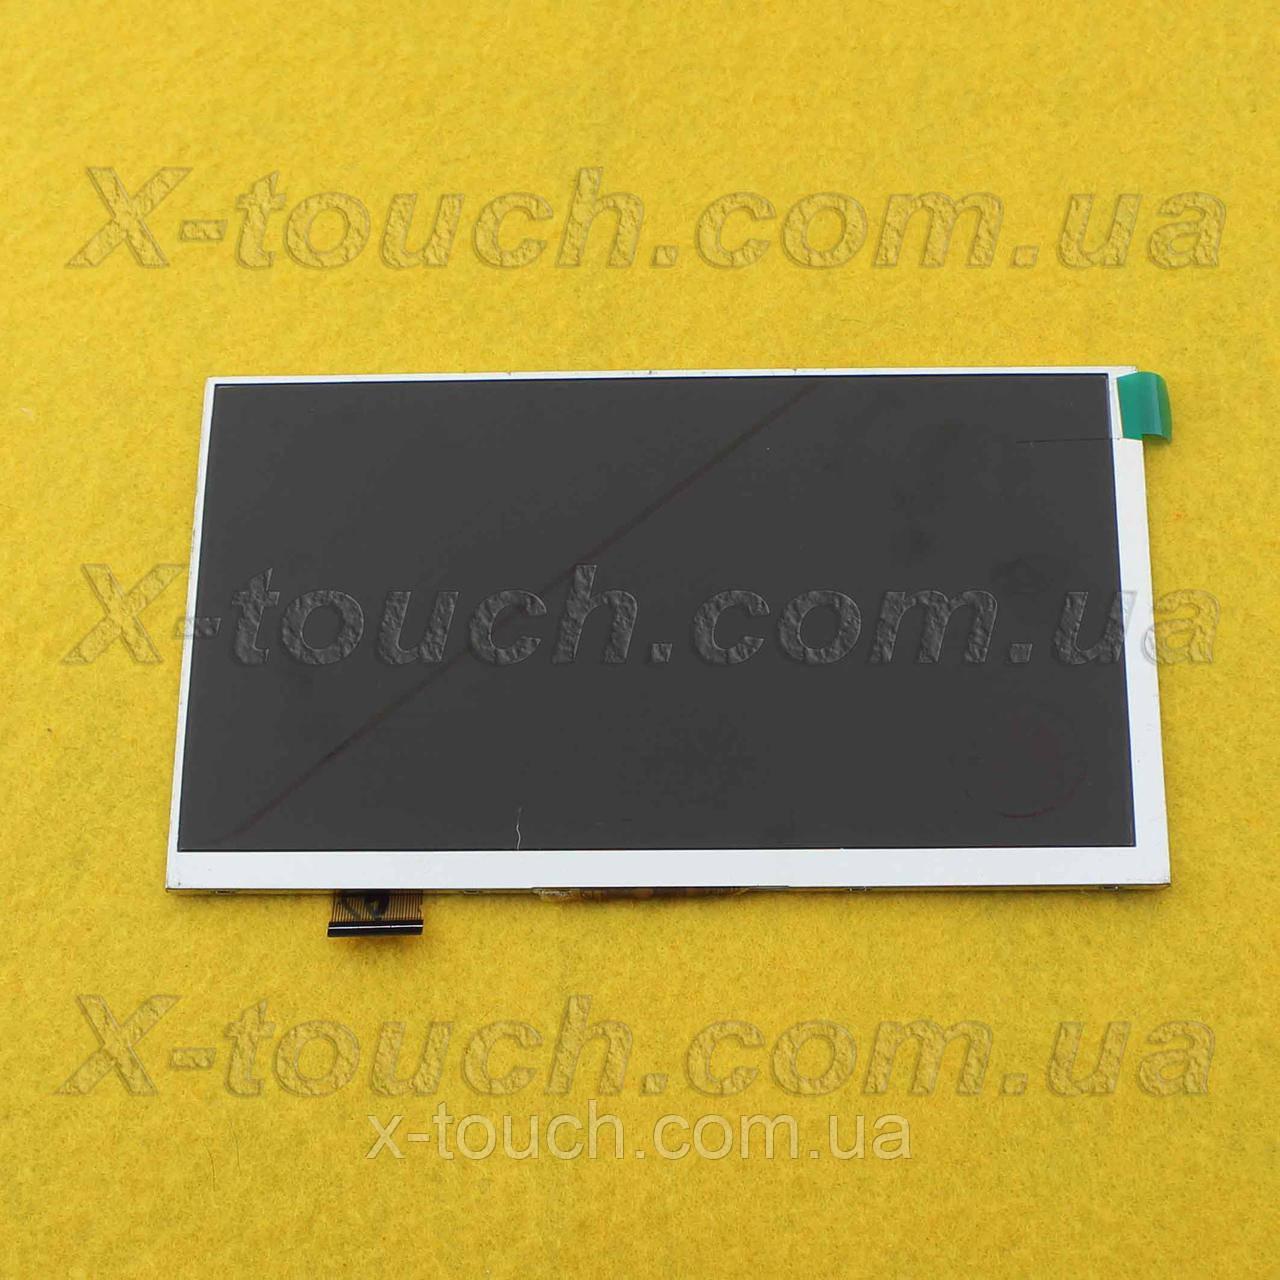 Матриця,екран, дисплей Elenberg Tab728 для планшета